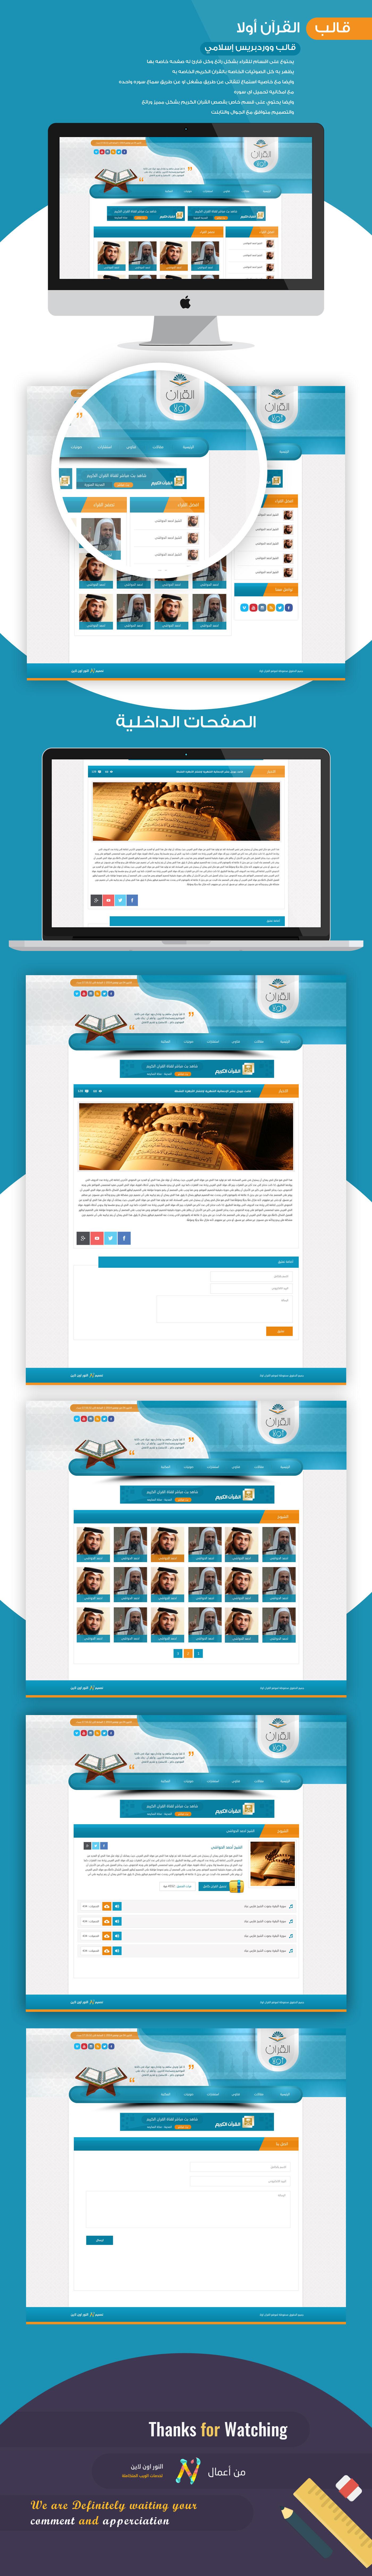 elnooronline,wordpress,Desgin,corporate,creative,Multipurpose,logo,template,تصميم,شعار,لوجو,ووردبريس,مدونة,تصميم موقع,النور اون لاين